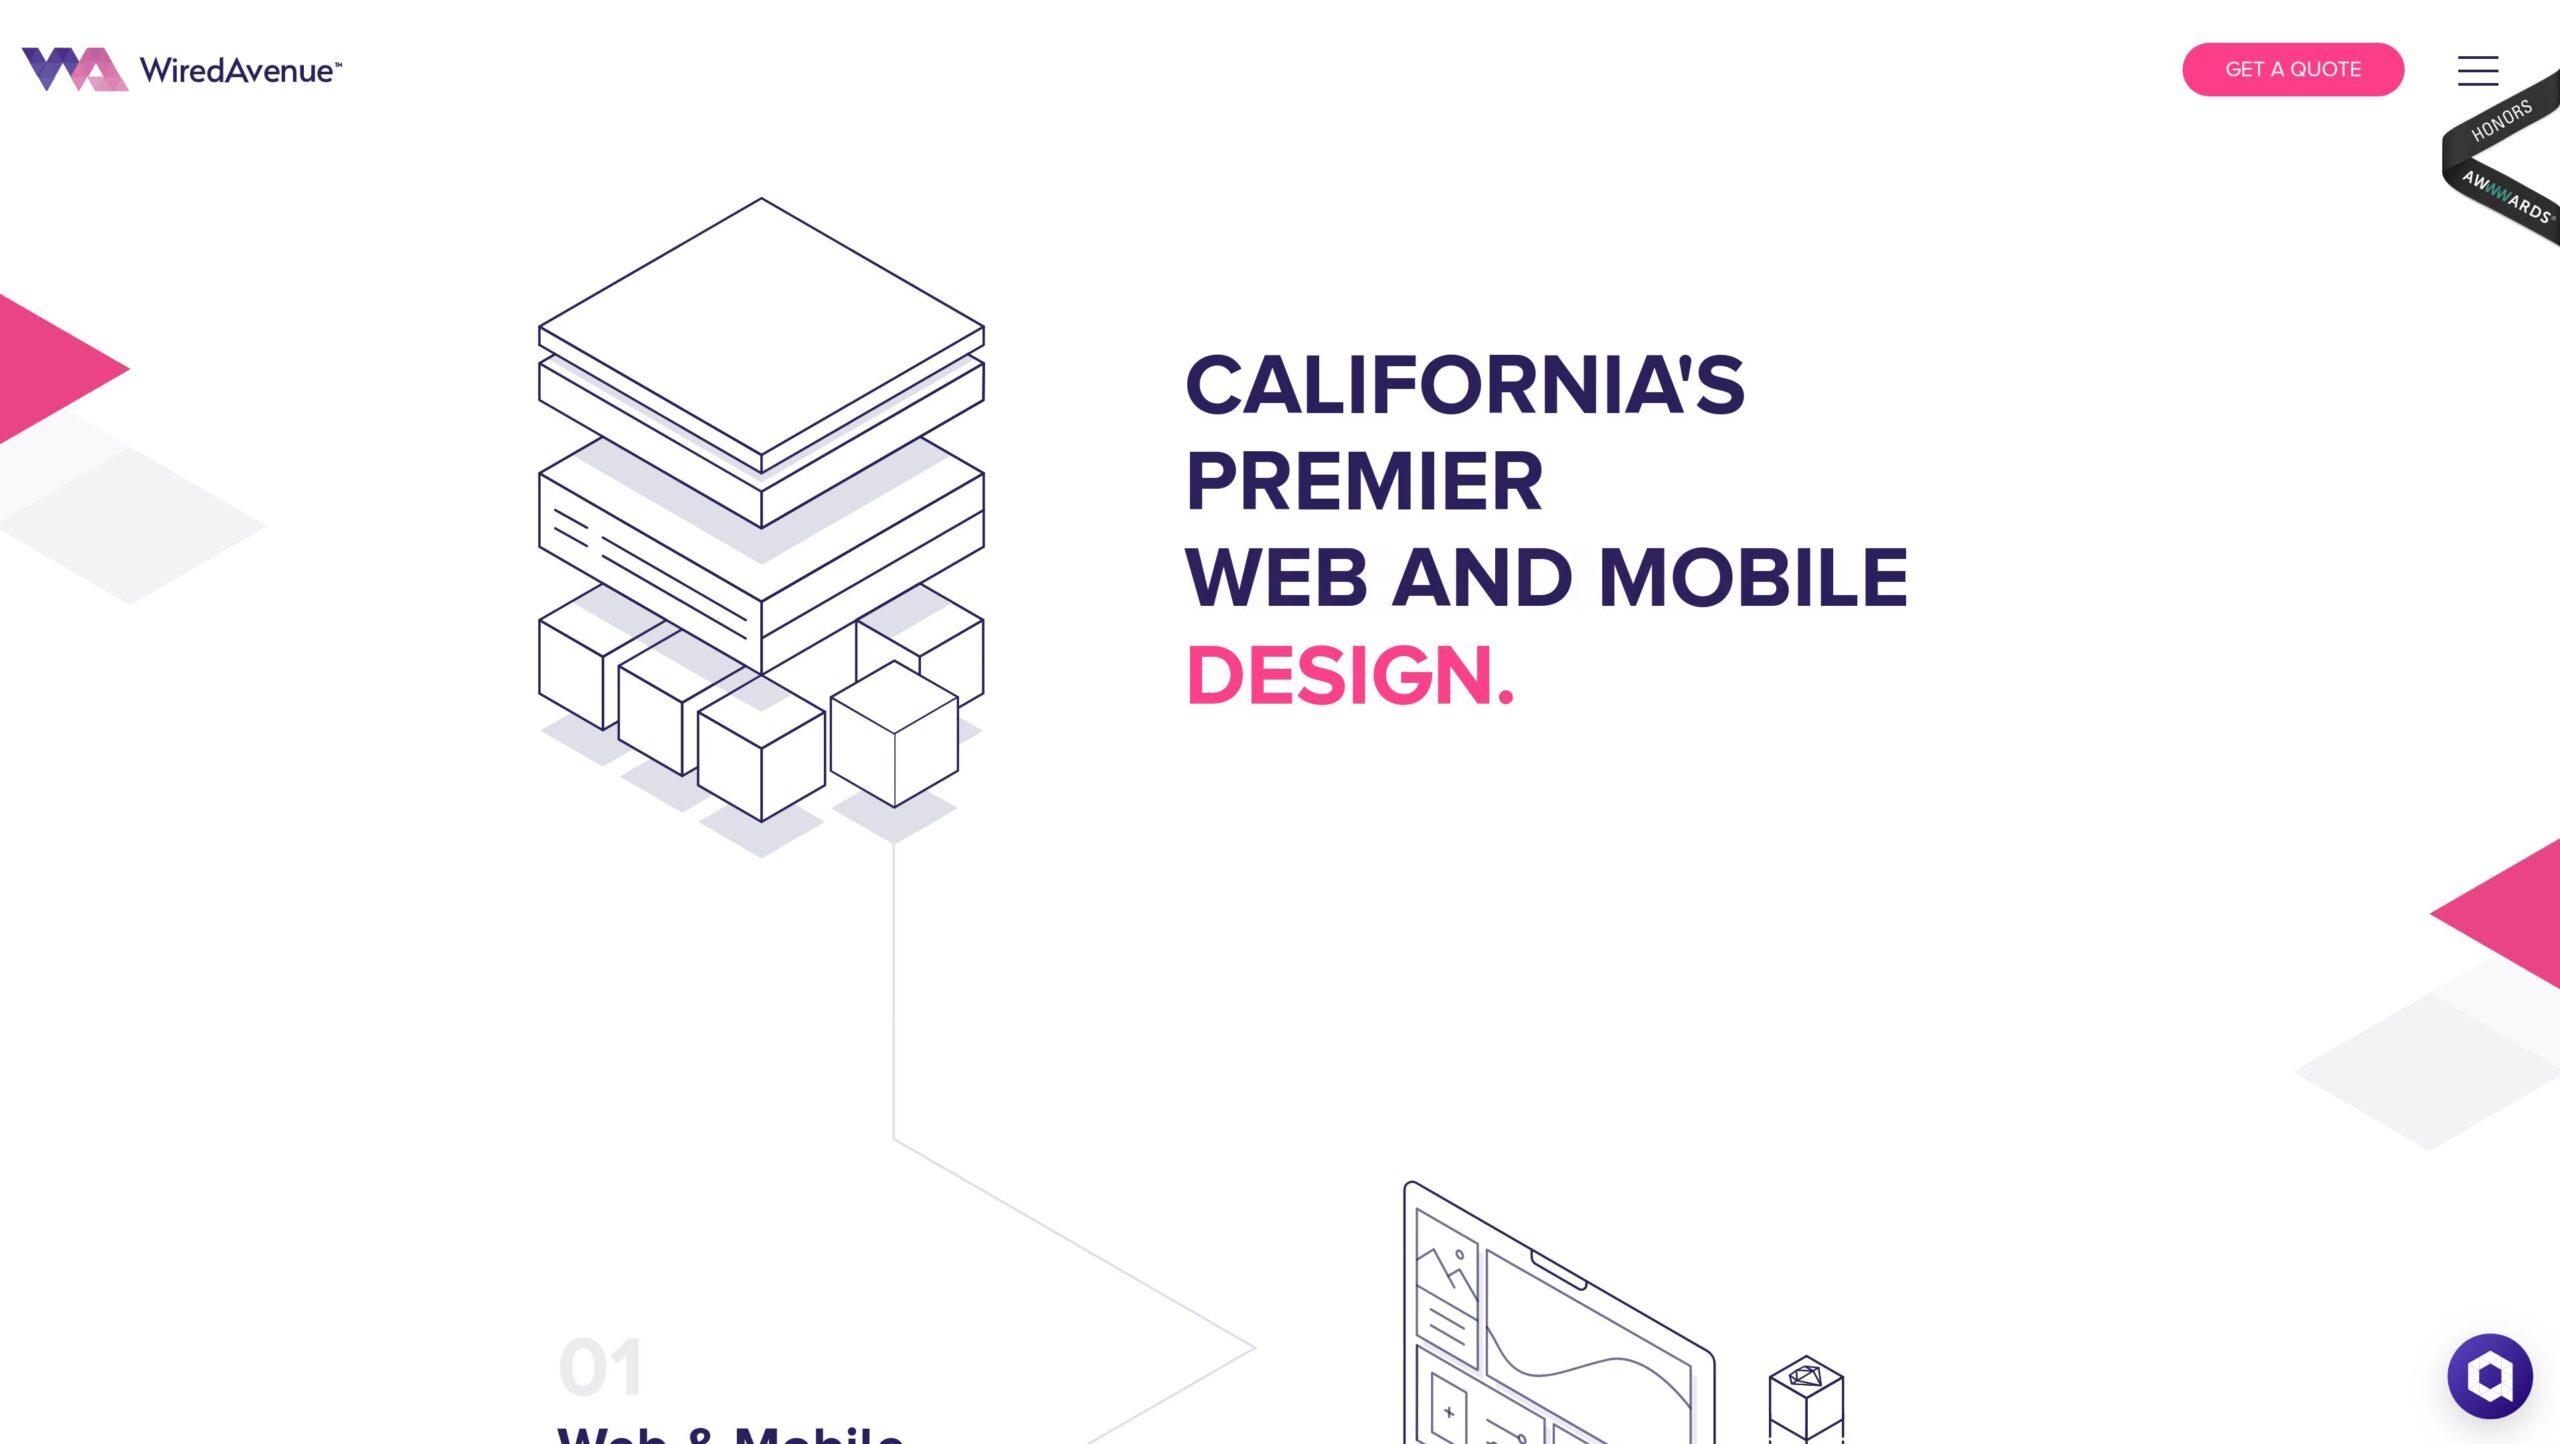 Orpetron Web Design Awards - Wired Avenue - Web Design Awards Inspiration Trends UI UX